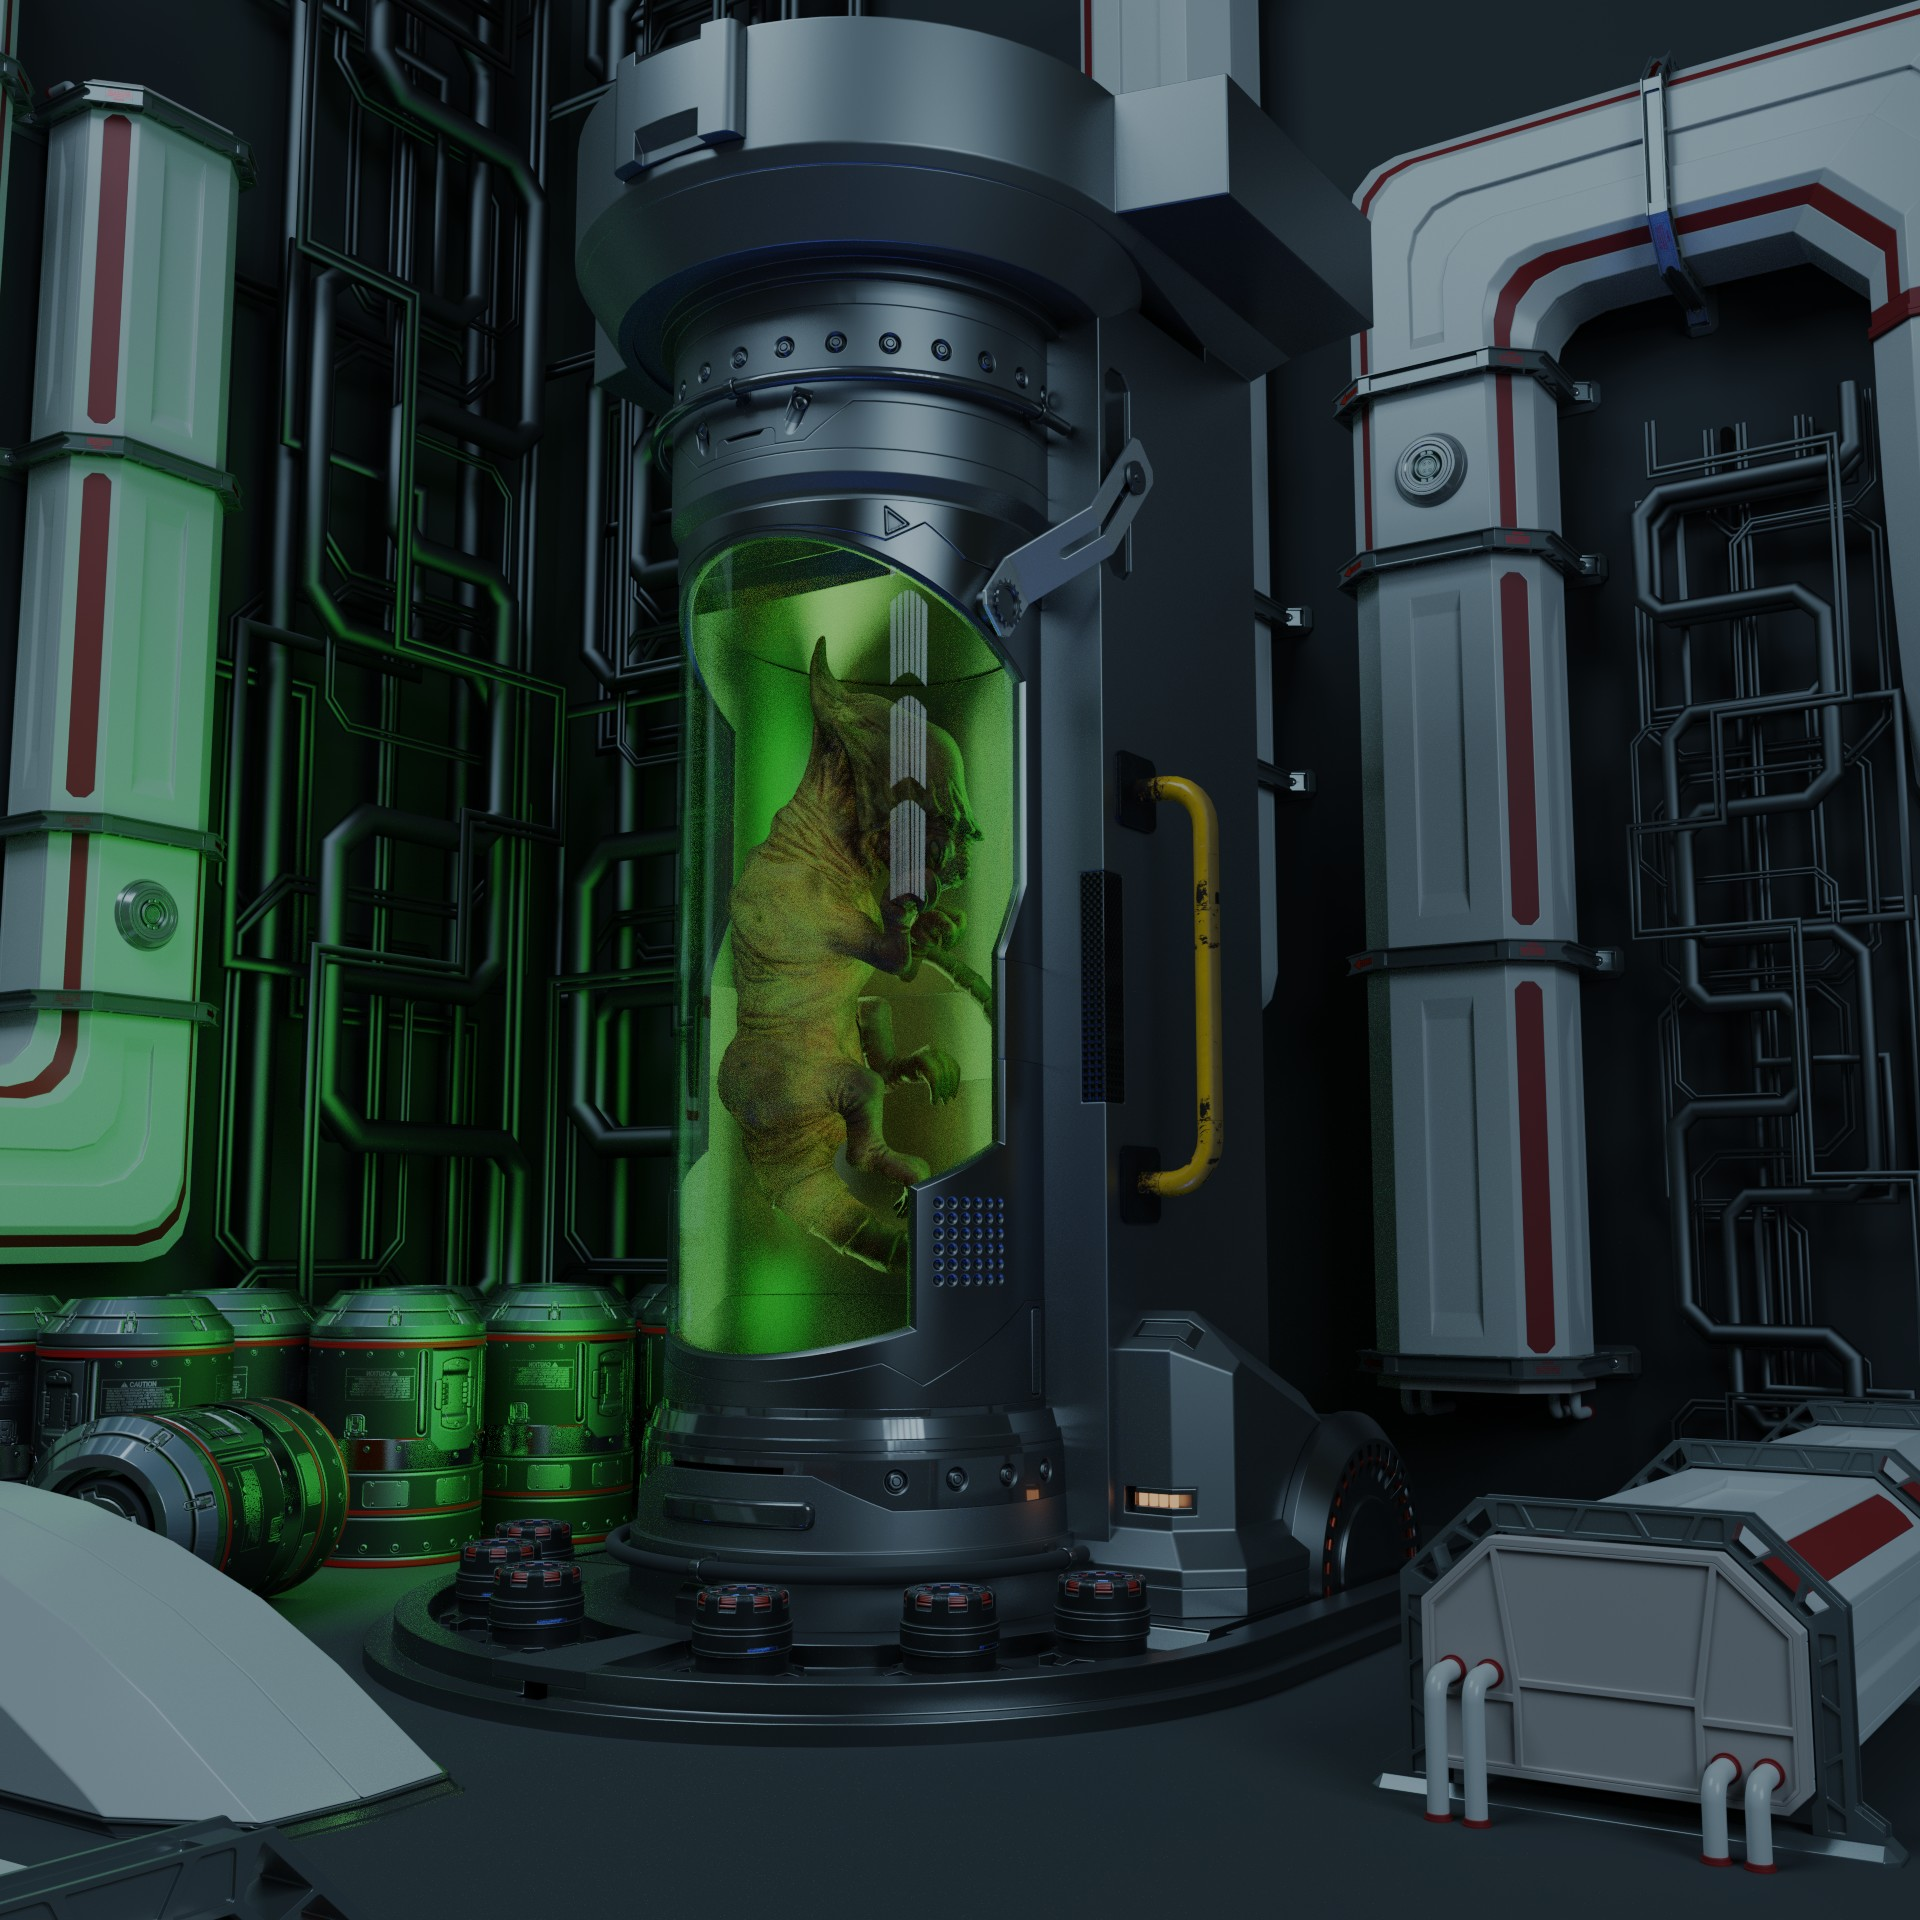 cryo tube alien embryo cryo tube 3d. Black Bedroom Furniture Sets. Home Design Ideas